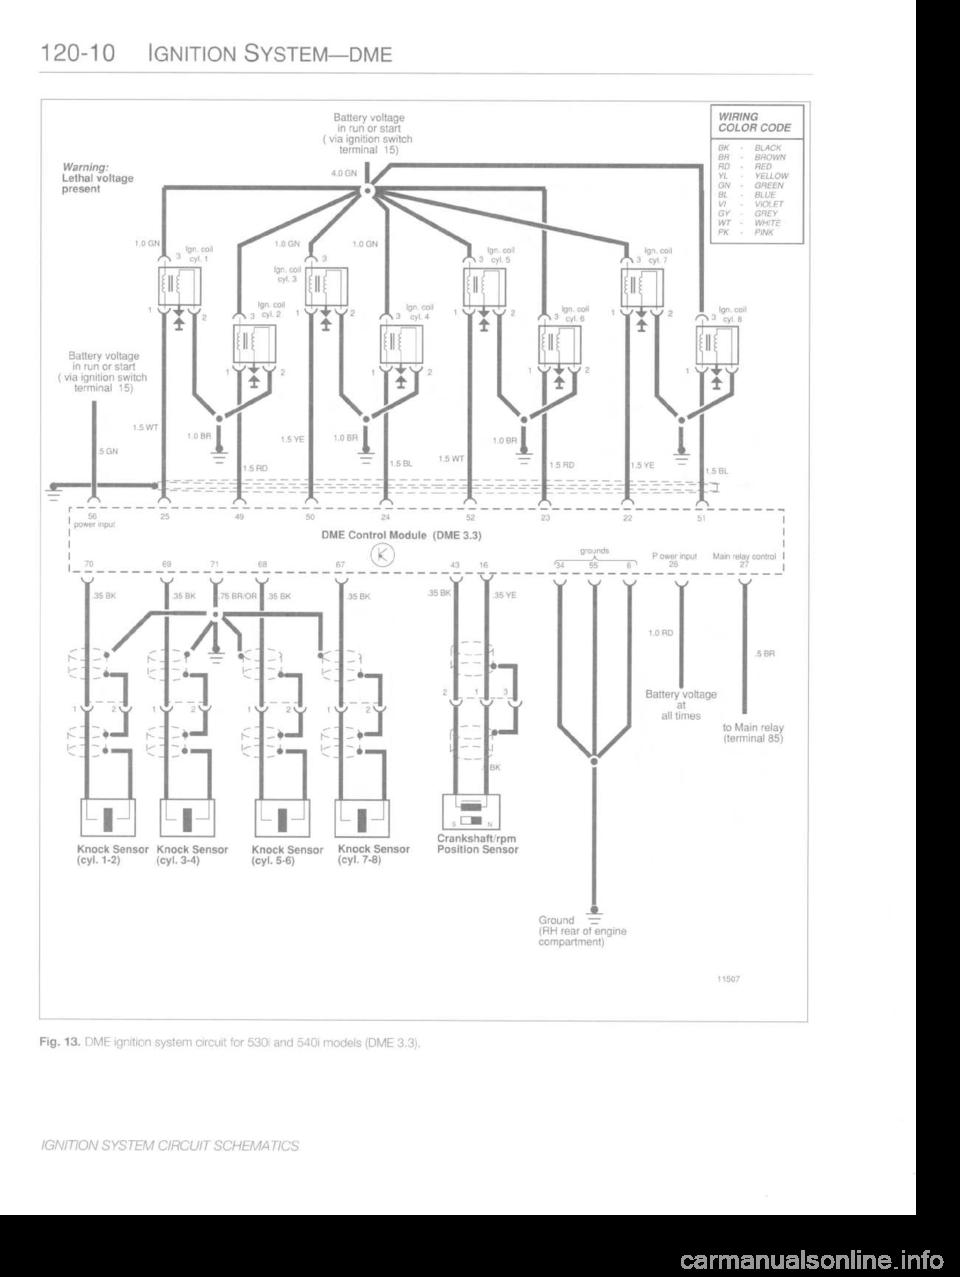 E34 Ignition Switch Wiring Diagram Harley Fuse Box Bmw 540i 1989 Workshop Manual E On